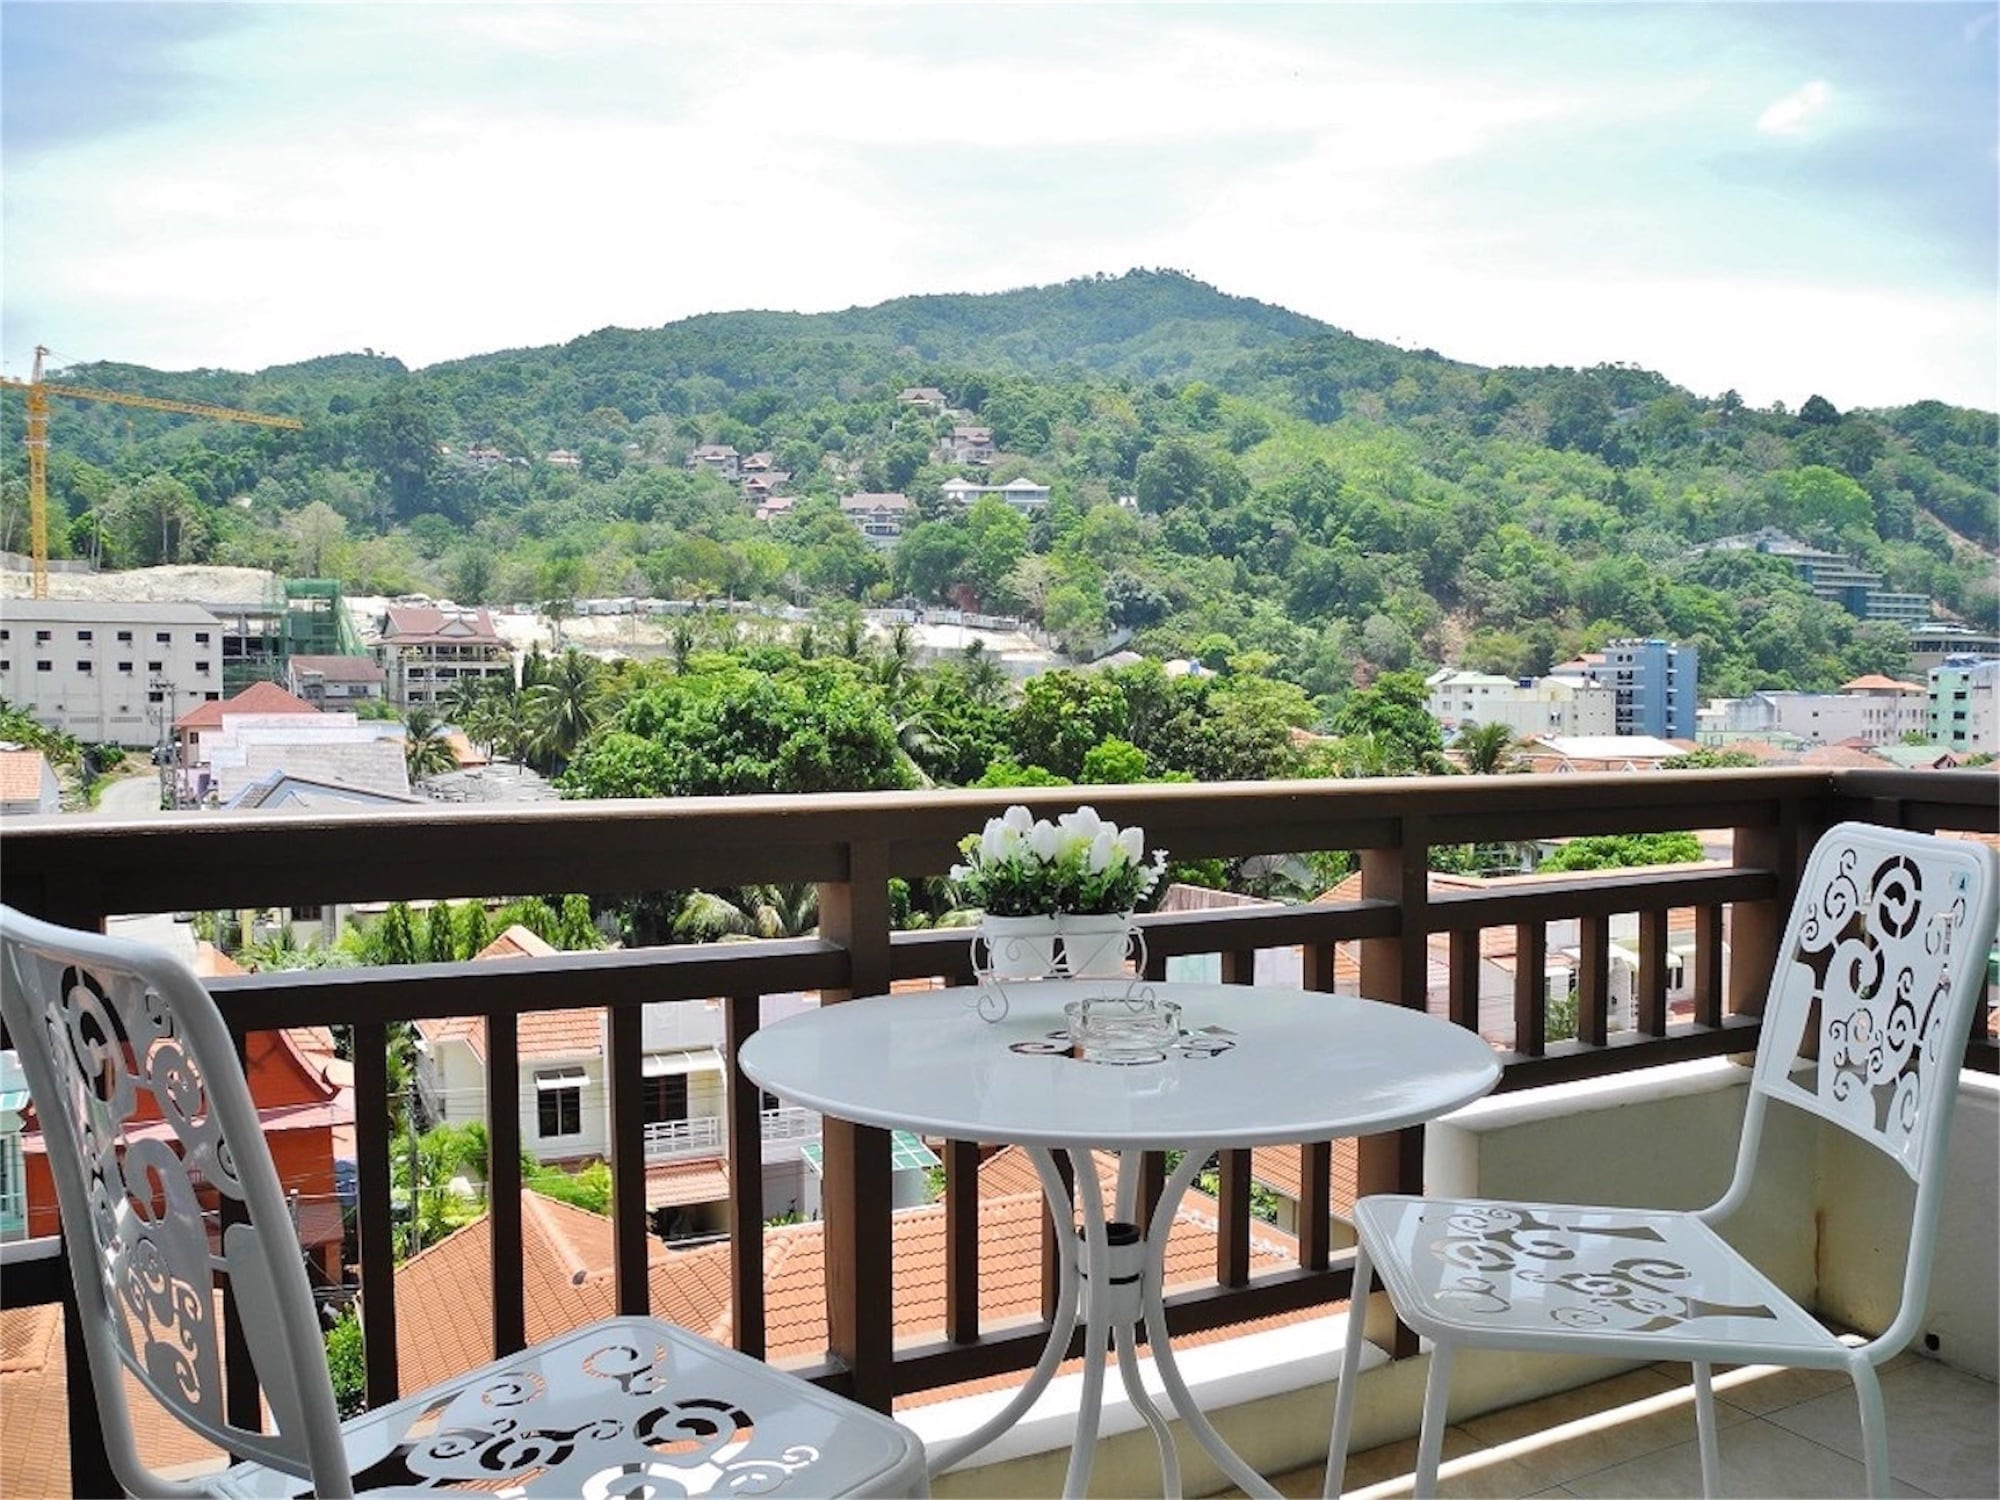 Phuket Villa Patong 1 bedroom Apartment Mountain View, Pulau Phuket